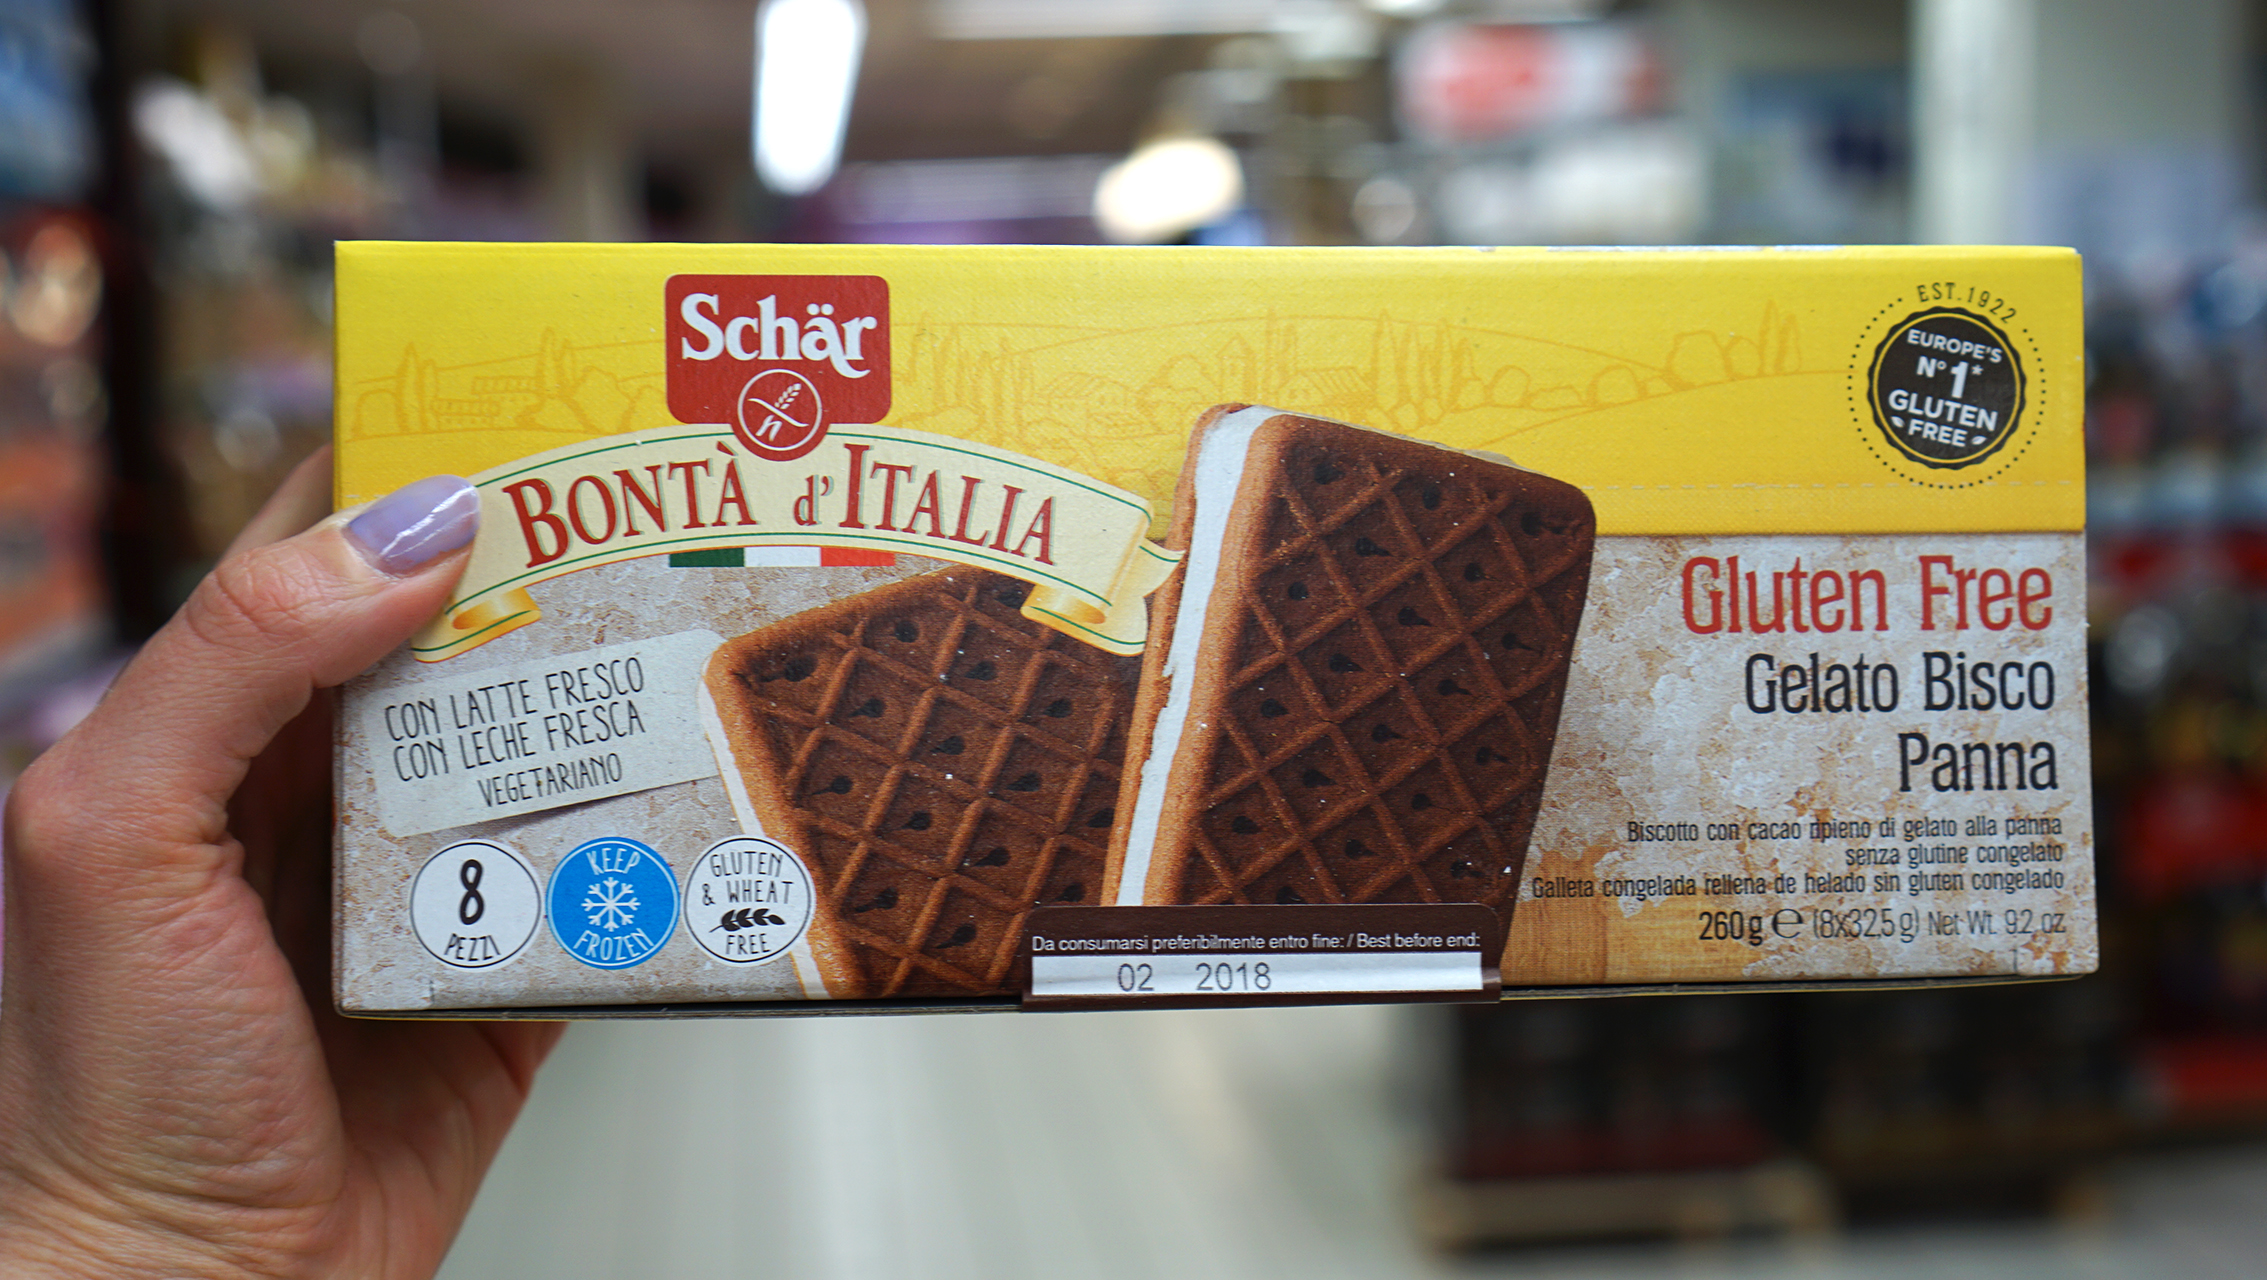 Gluten free Shar ice cream sandwiches at Coop in Venice - gluten free Venice guide